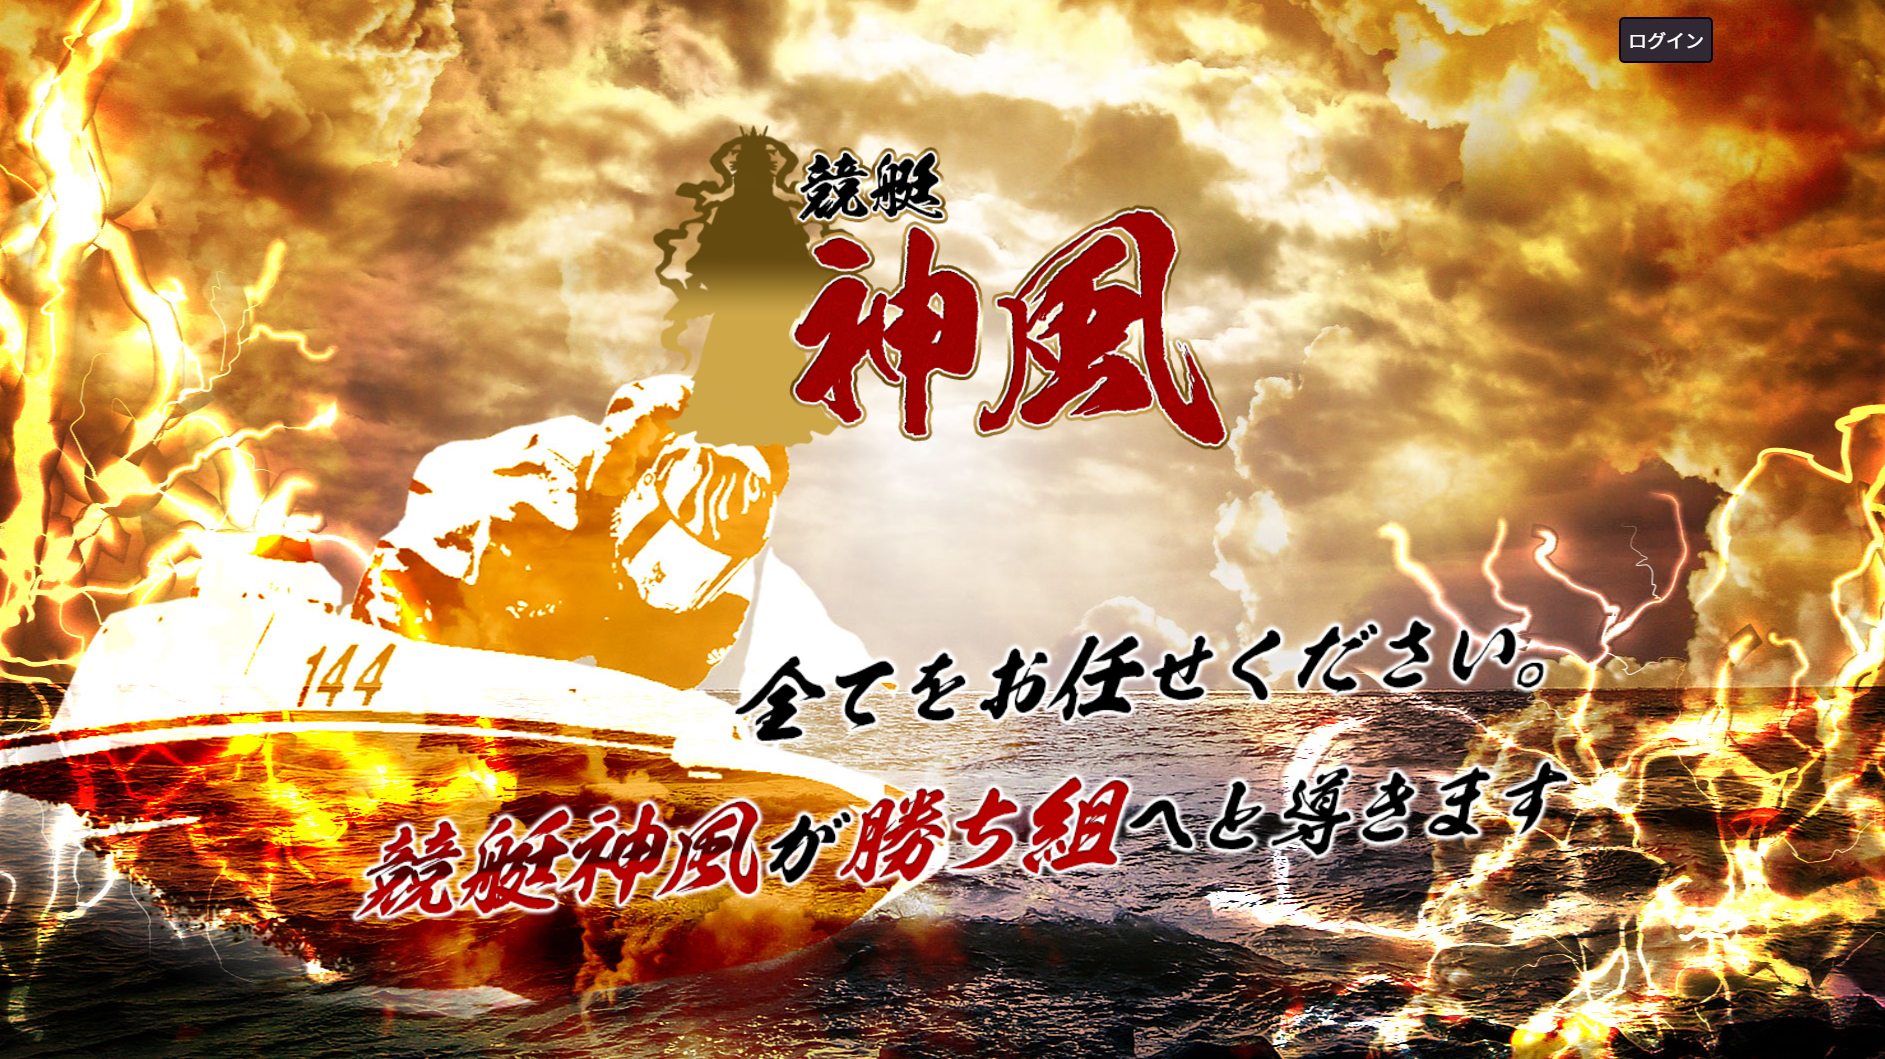 競艇神風の口コミ・評判・評価